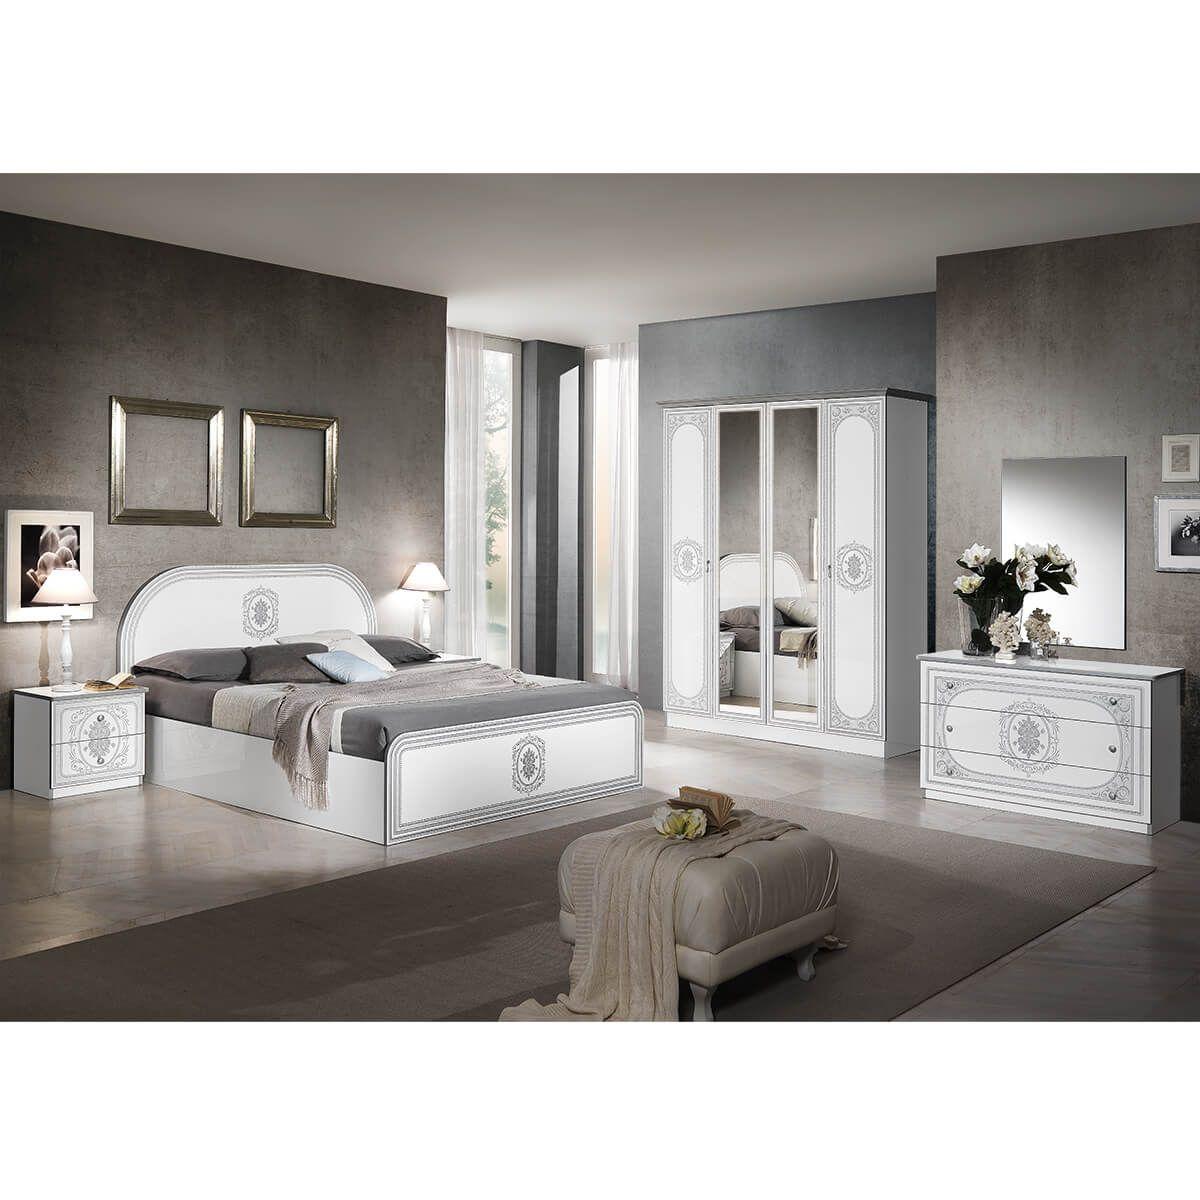 Altobuy-Solaya-Chambre-Complete-avec-Lit-160x200cm-Neuf